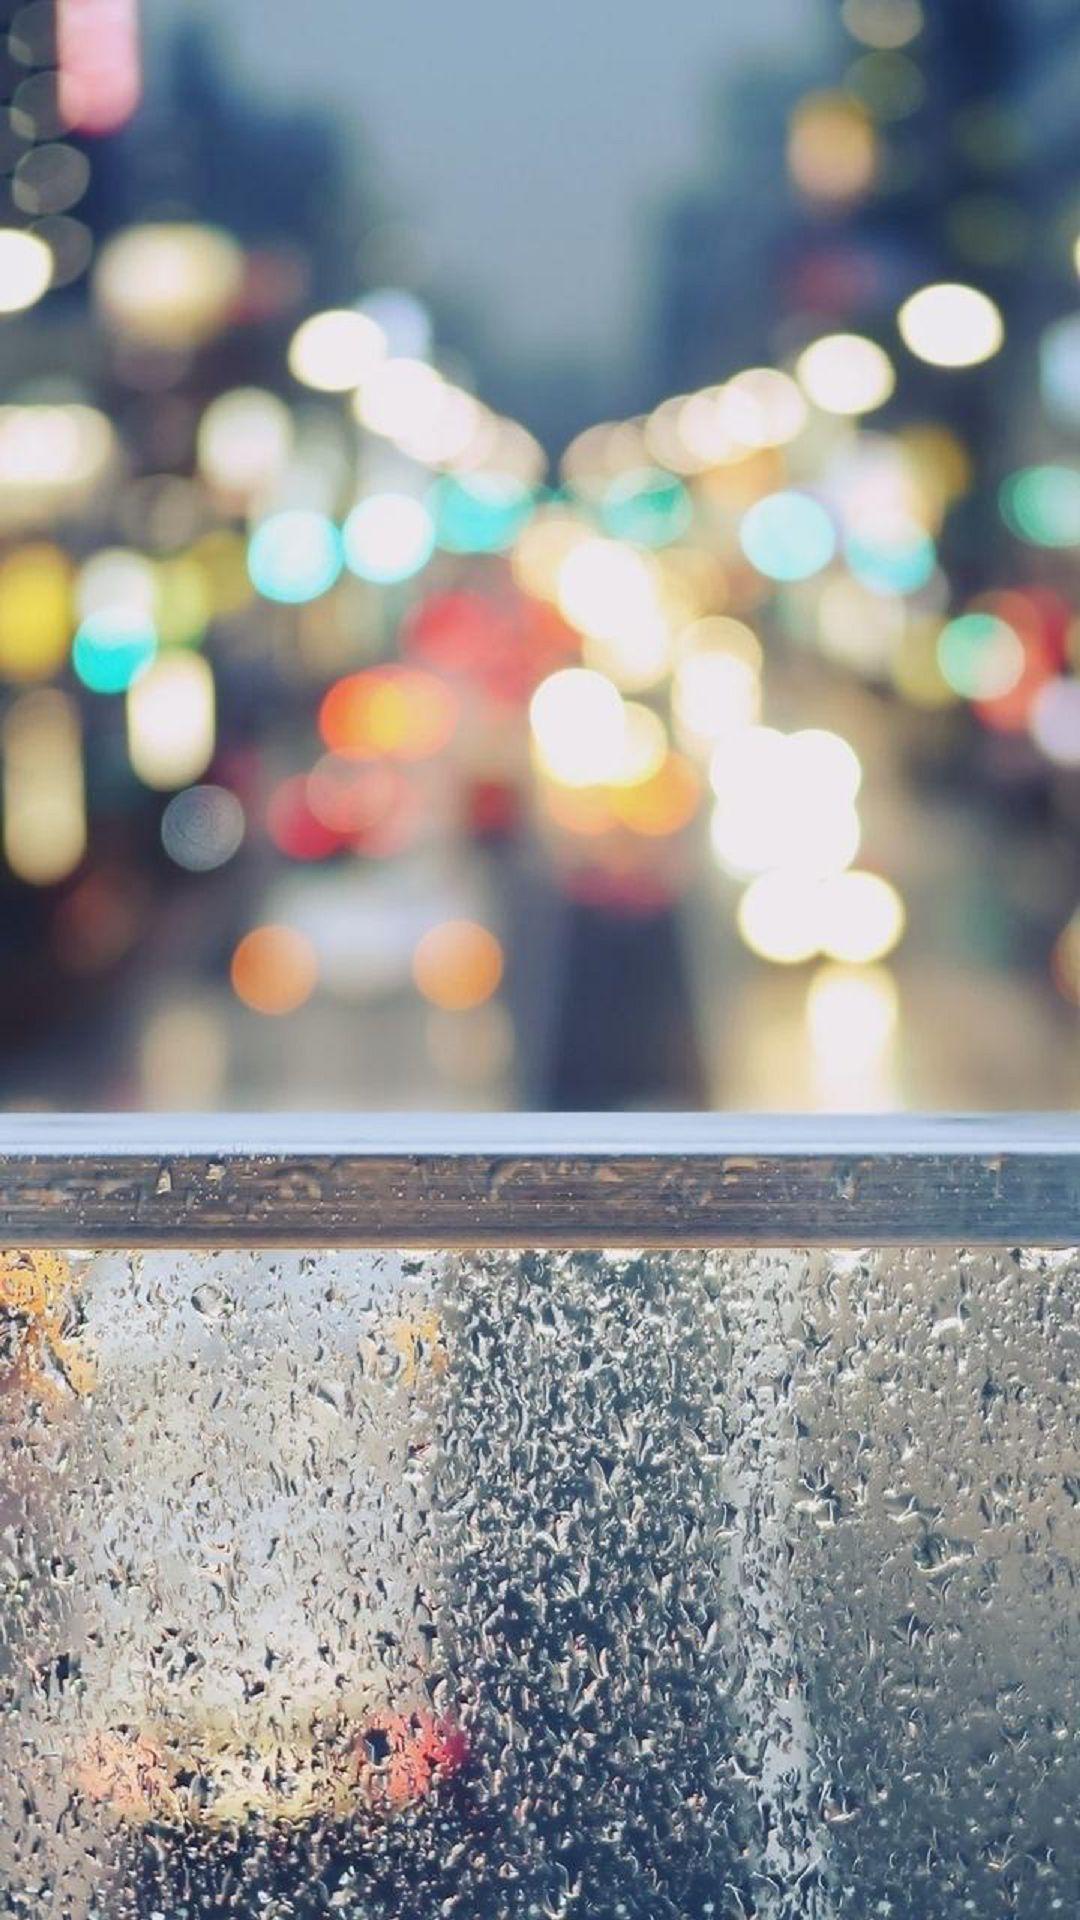 Rain iphone wallpaper tumblr - Rainy Street Window Bokeh Iphone 6 Plus Wallpaper